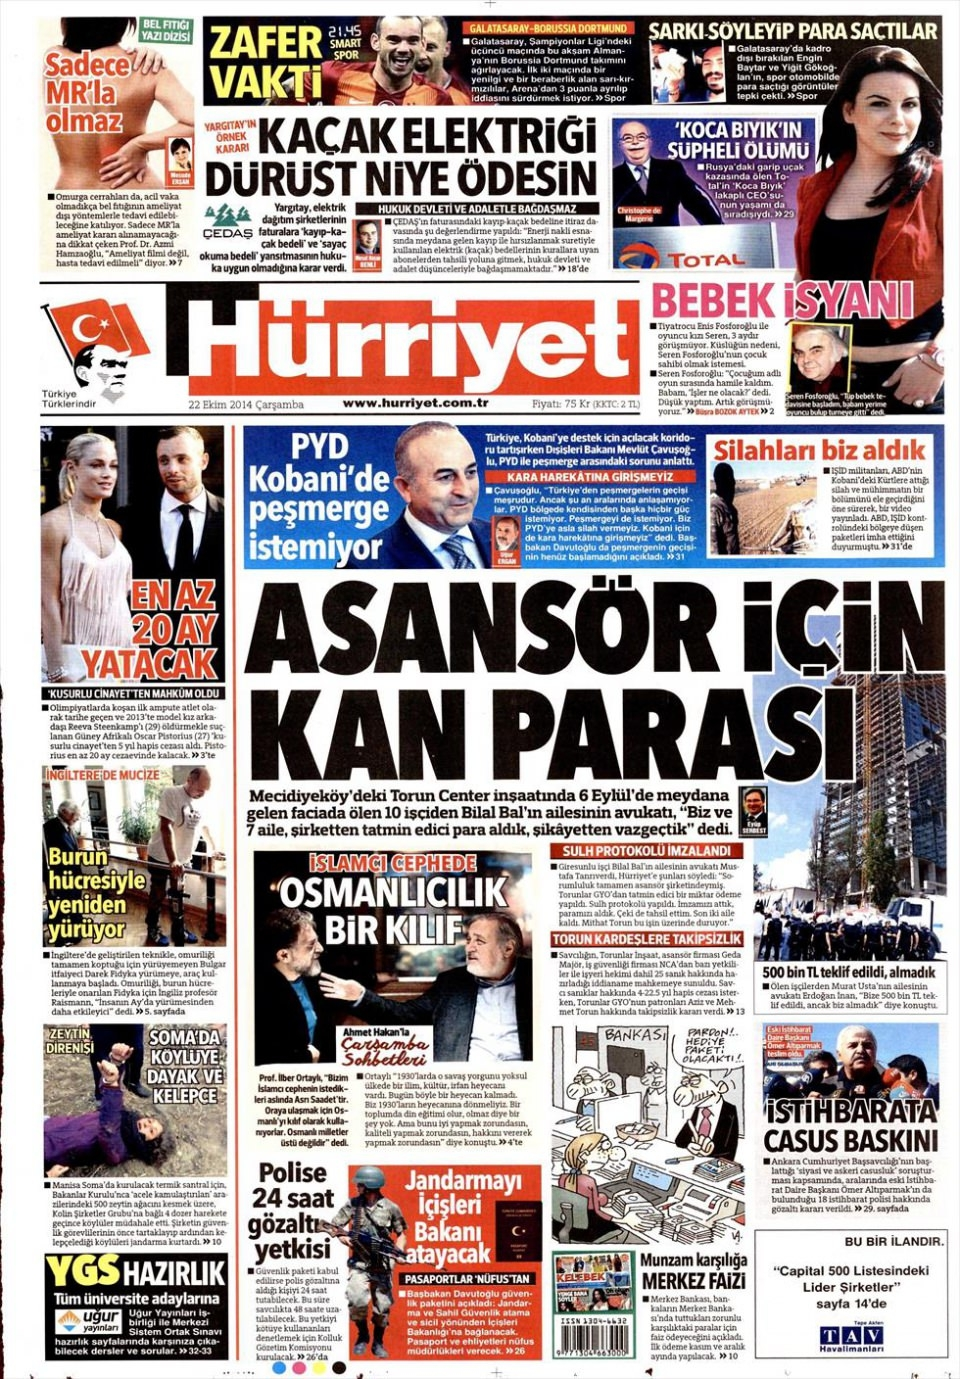 22 Ekim 2014 gazete manşetleri 10